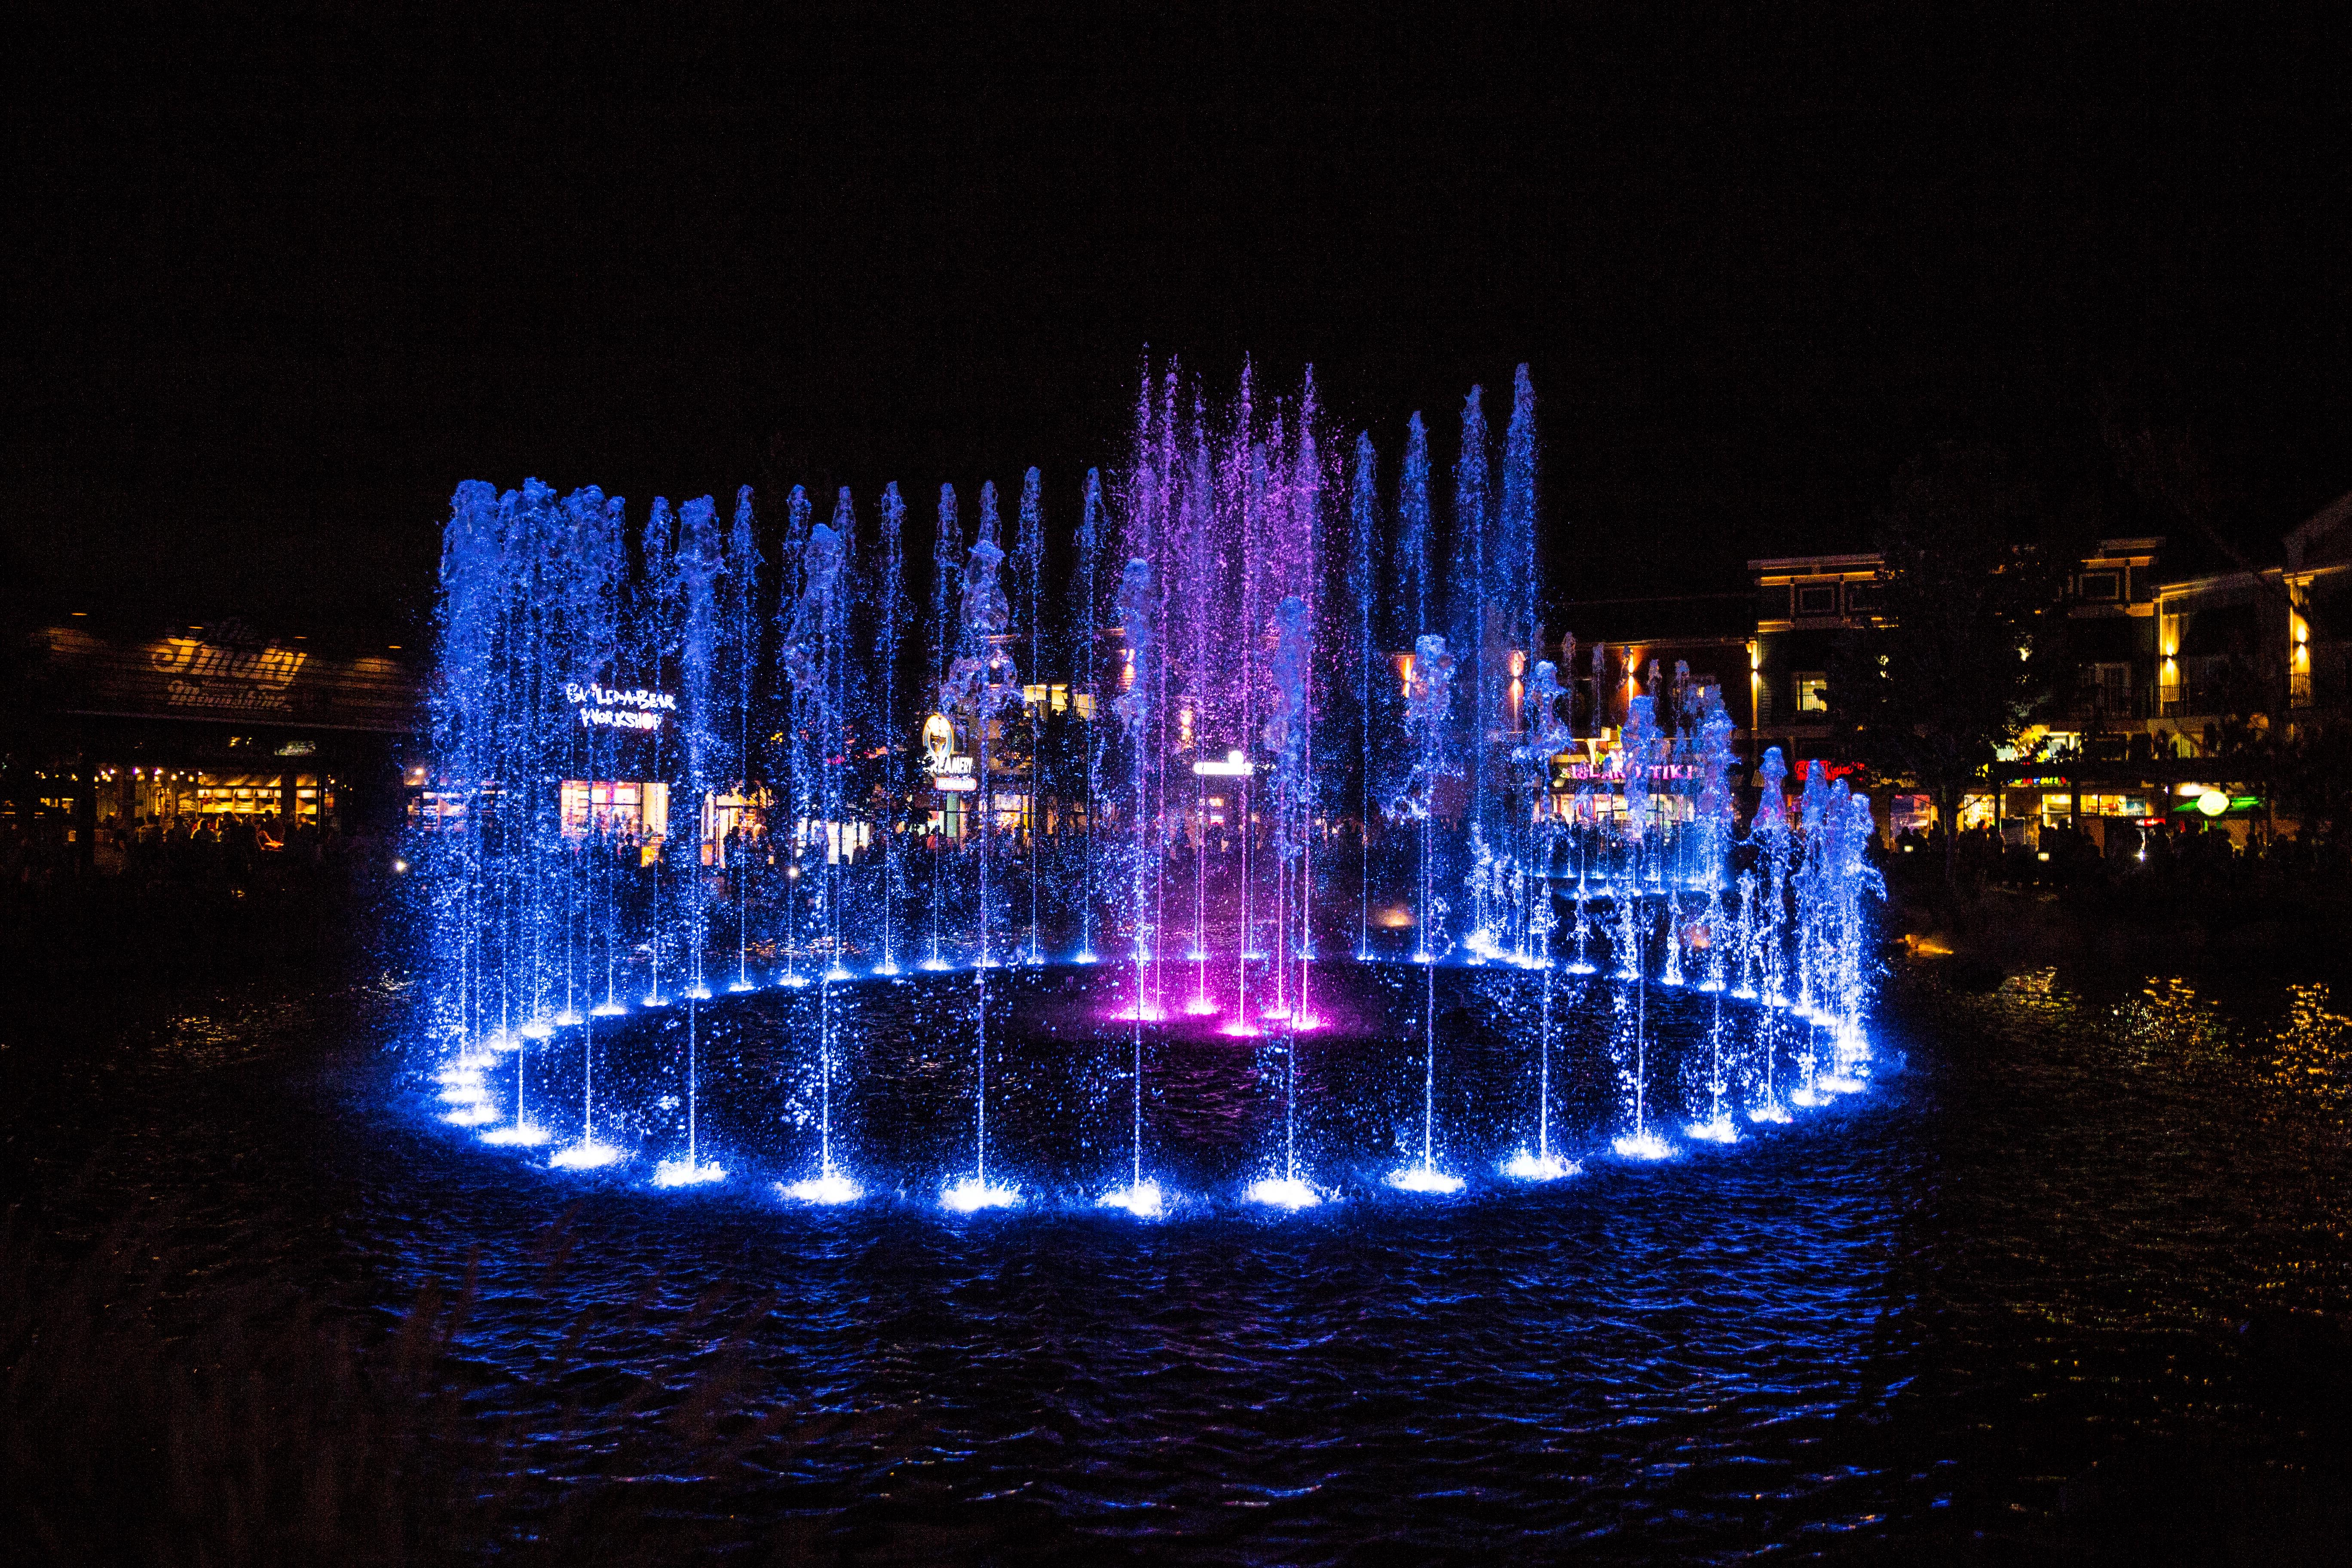 The Island Show Fountain: FAQ - The Island at Pigeon Forge